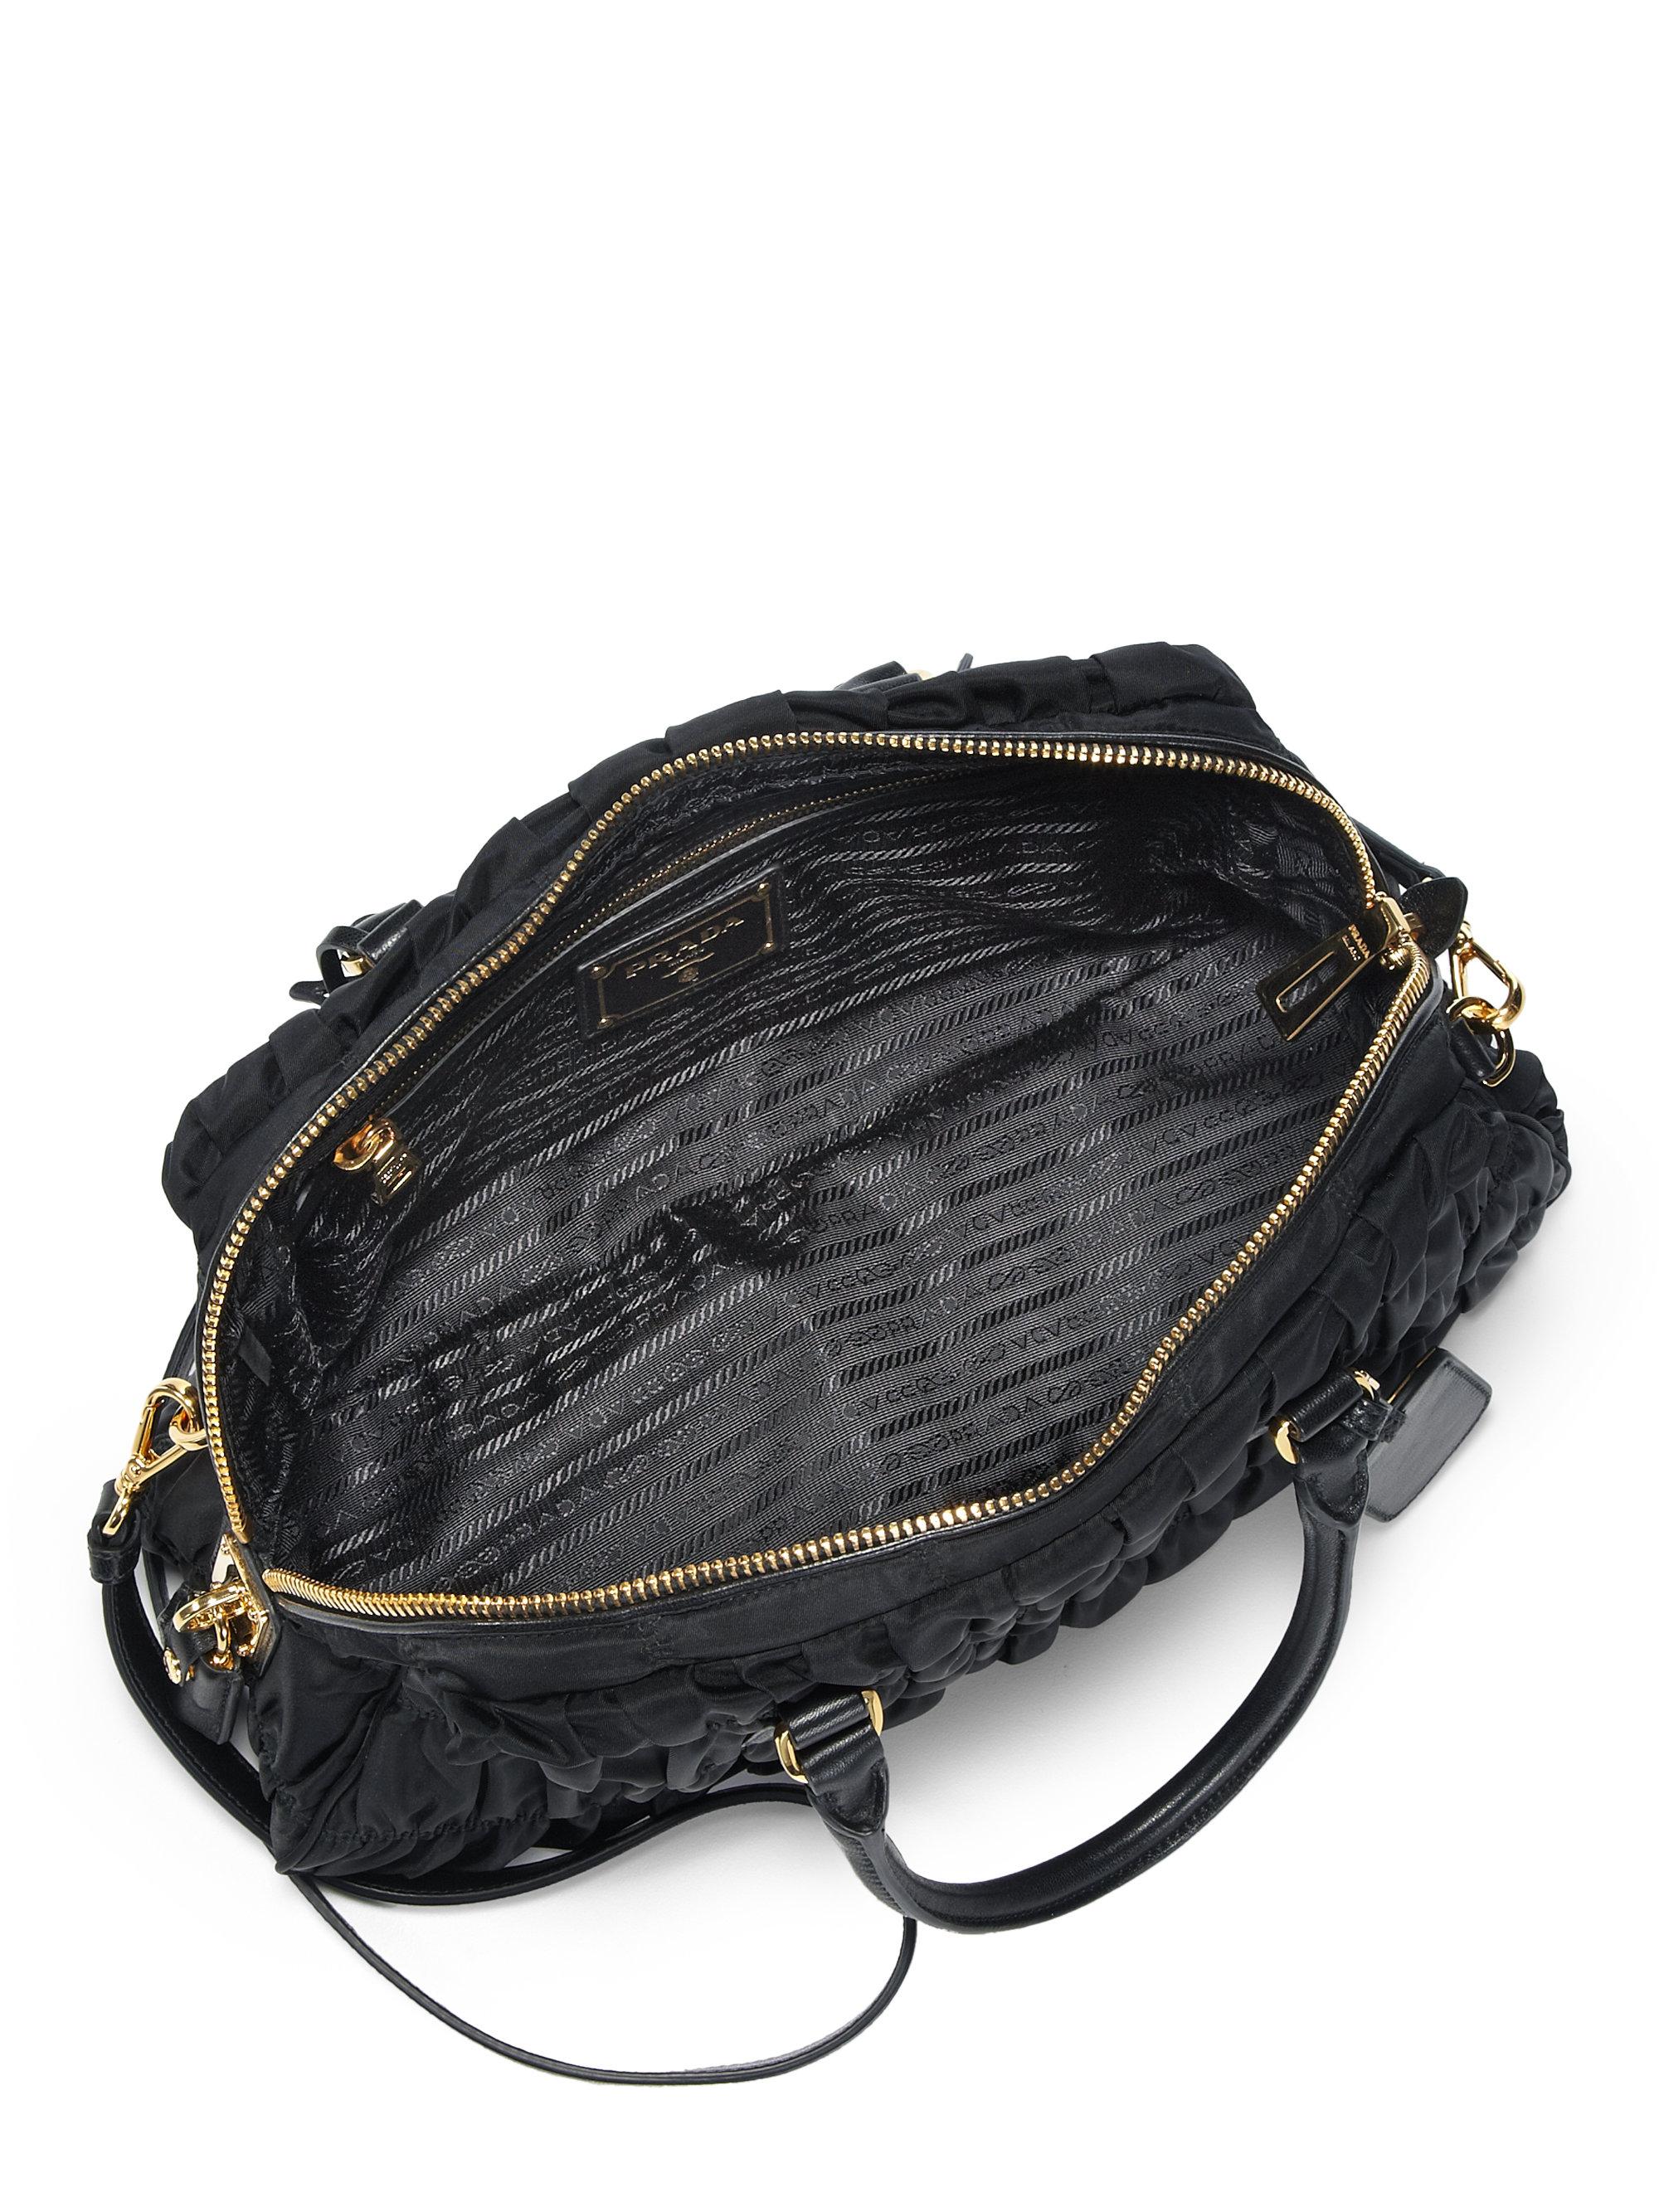 fe23382bbb2 Lyst - Prada Tessuto Gaufre Small Nylon Satchel in Black